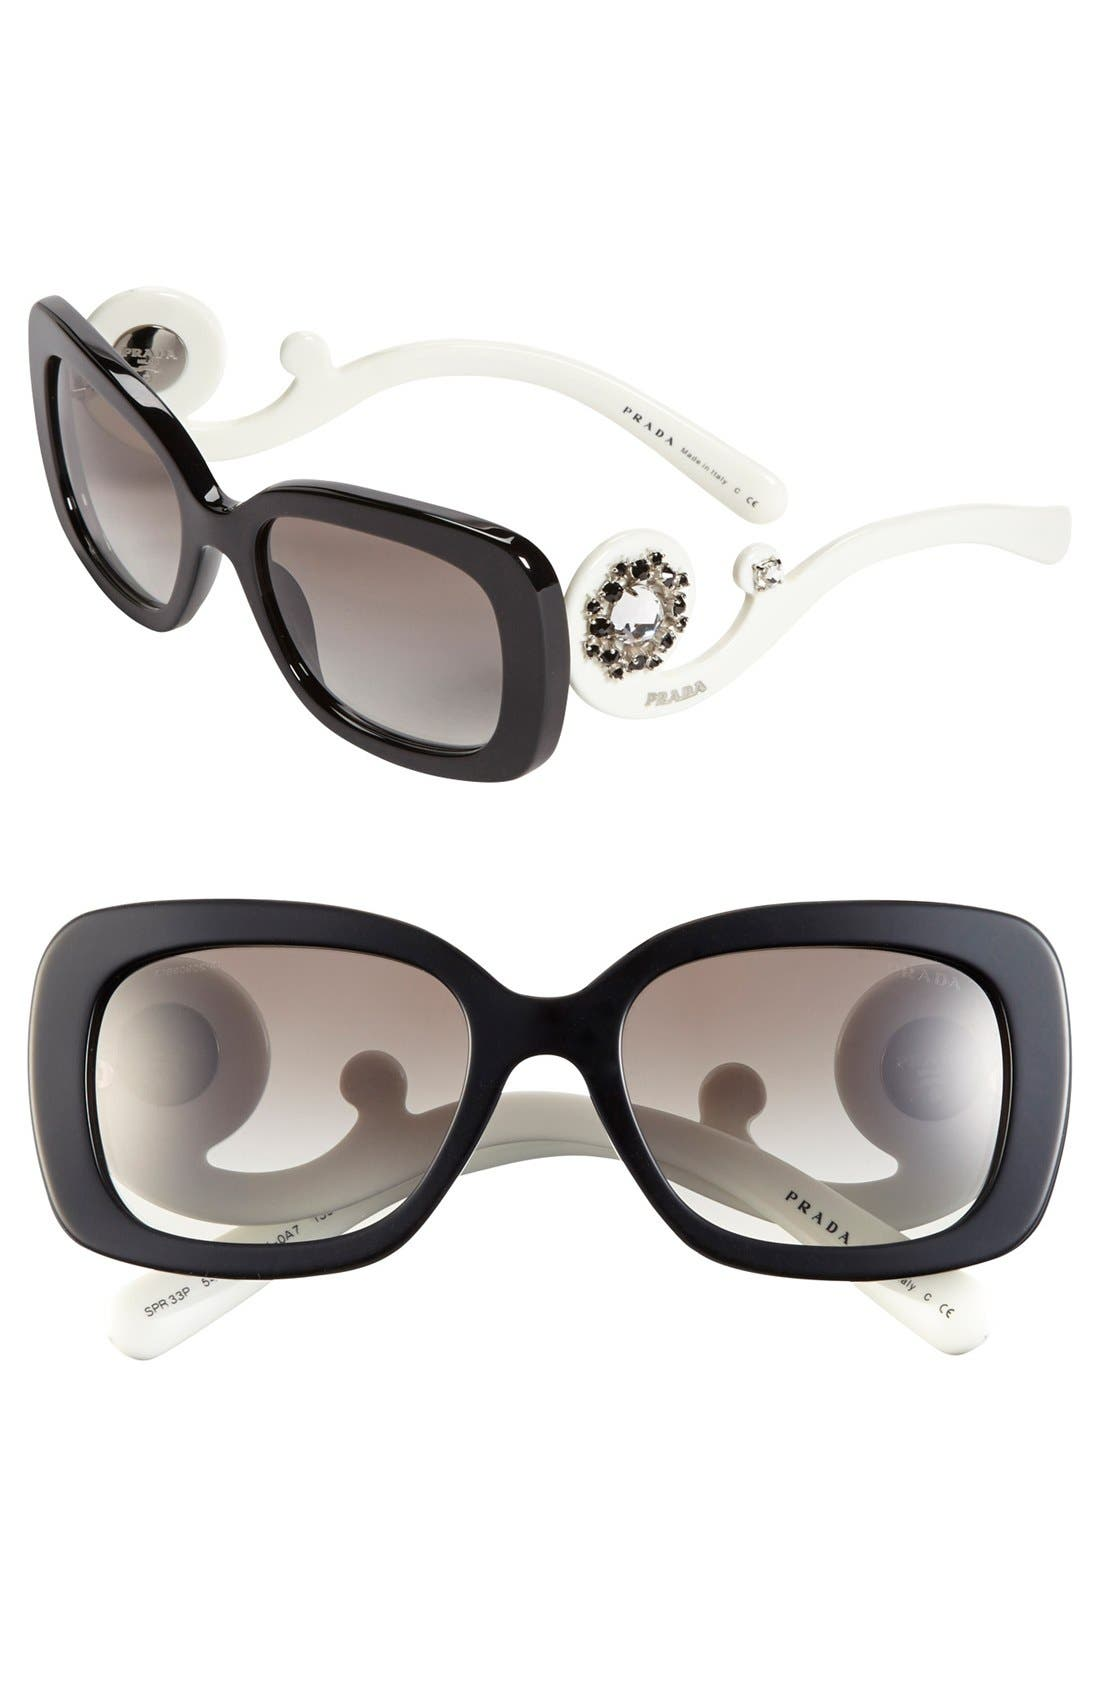 Alternate Image 1 Selected - Prada 54mm Polarized Sunglasses